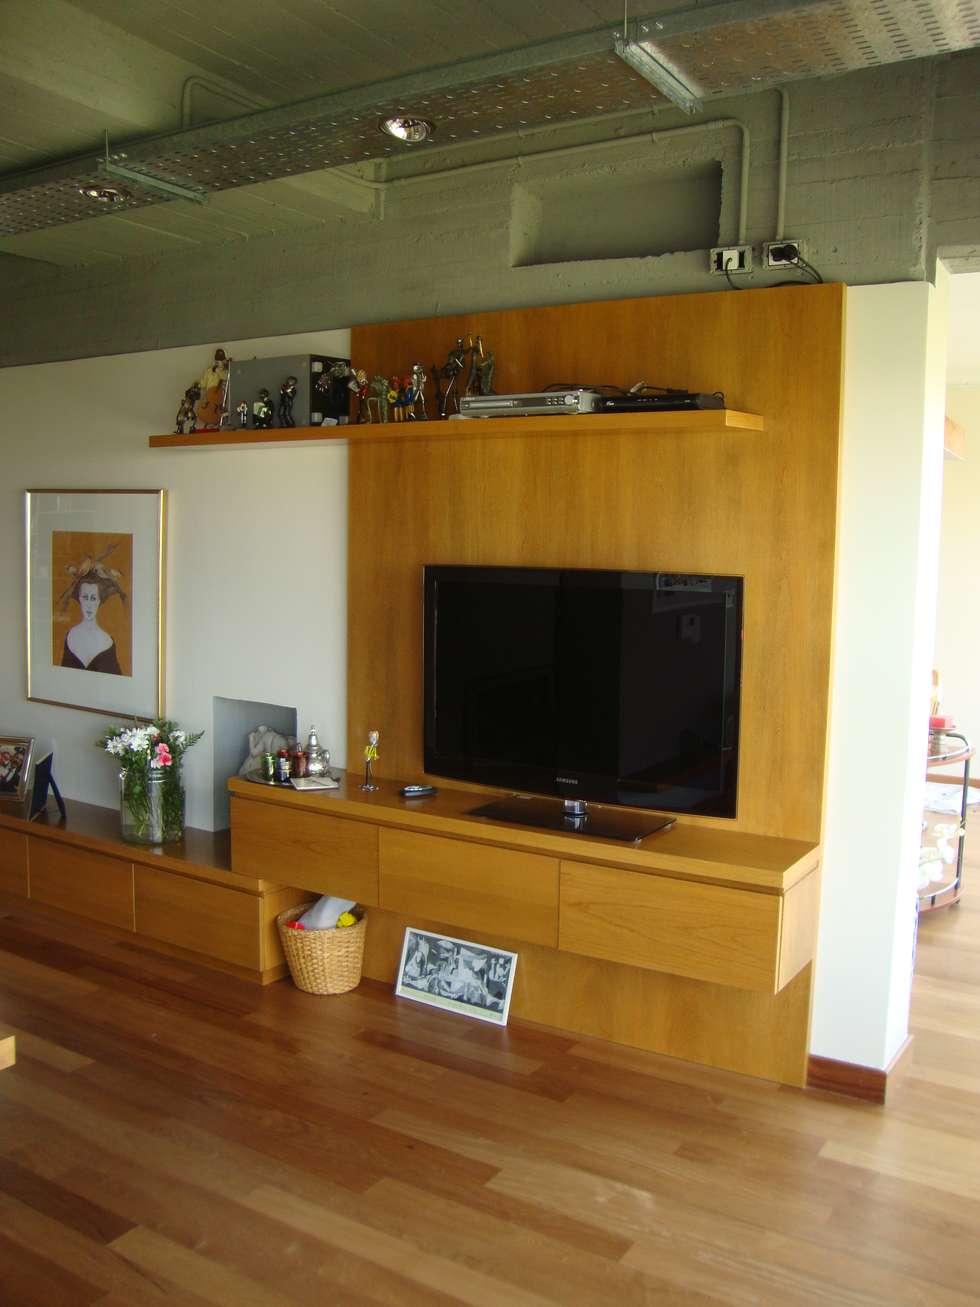 Sector TV: Salas multimedia de estilo moderno por Hargain Oneto Arquitectas